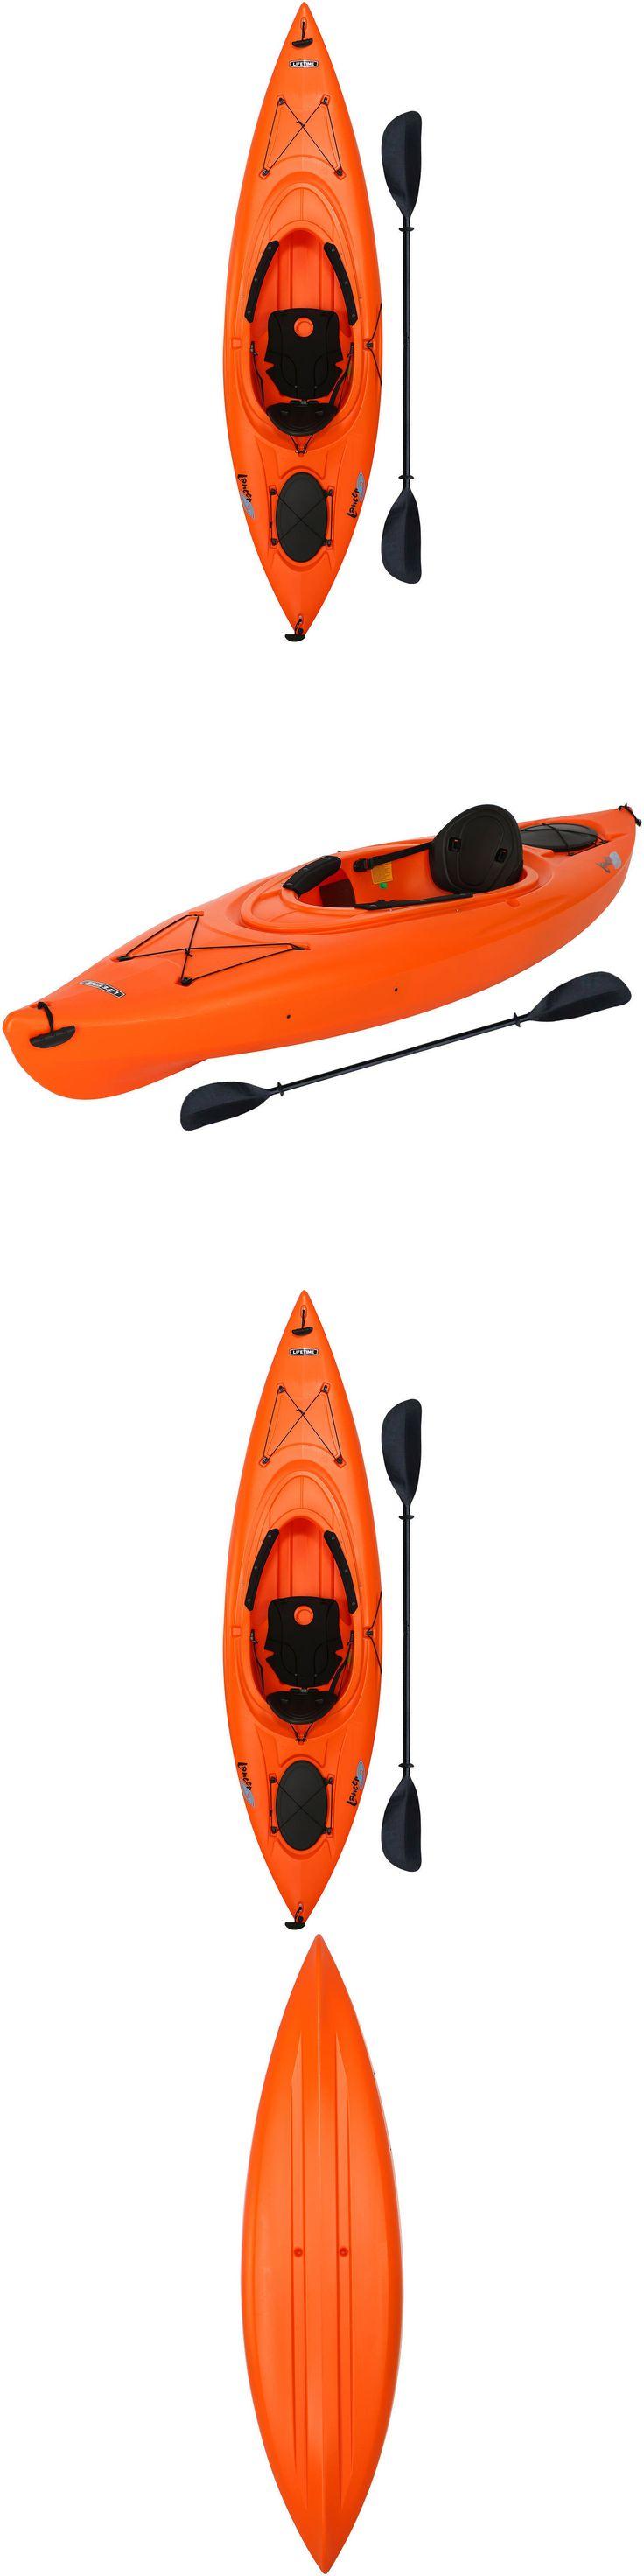 Kayaks 36122: New Lifetime Lancer 10 Sit-In Inside Lake, Ocean, Or River Kayak W Paddle -> BUY IT NOW ONLY: $399.99 on eBay!